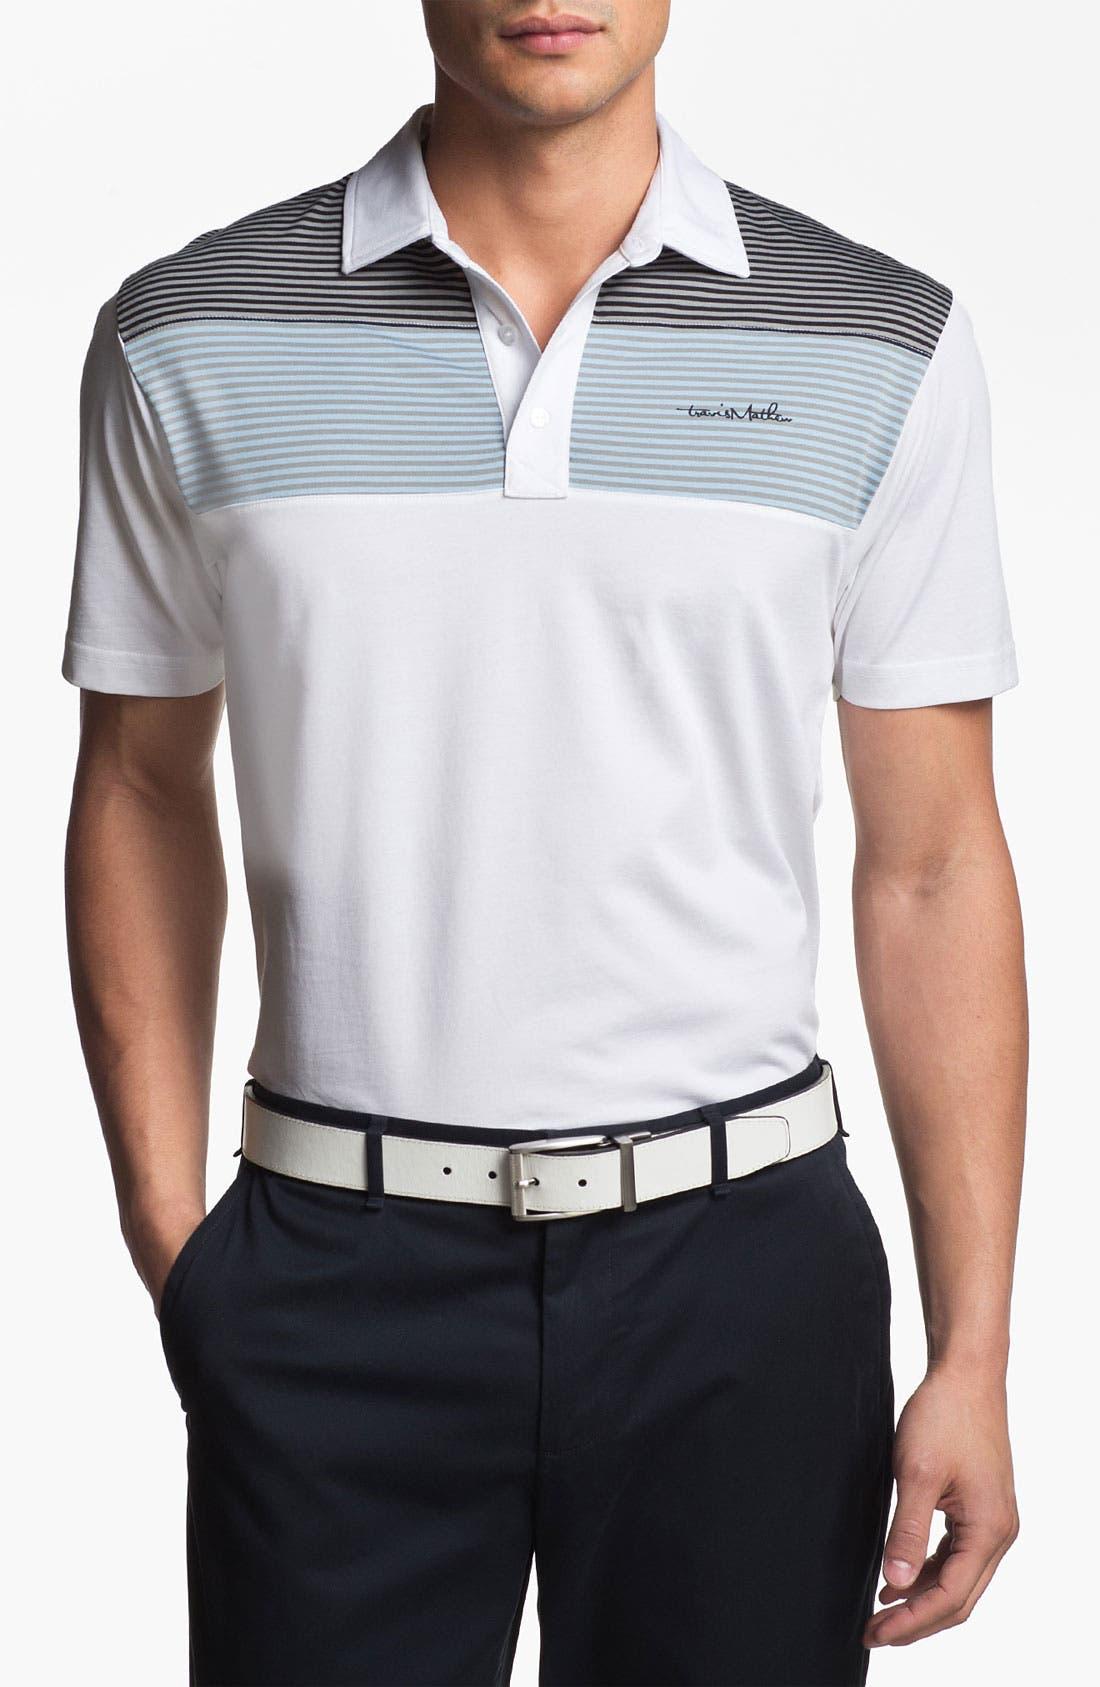 Alternate Image 1 Selected - Travis Mathew 'Mommasulo' Regular Fit Golf Polo